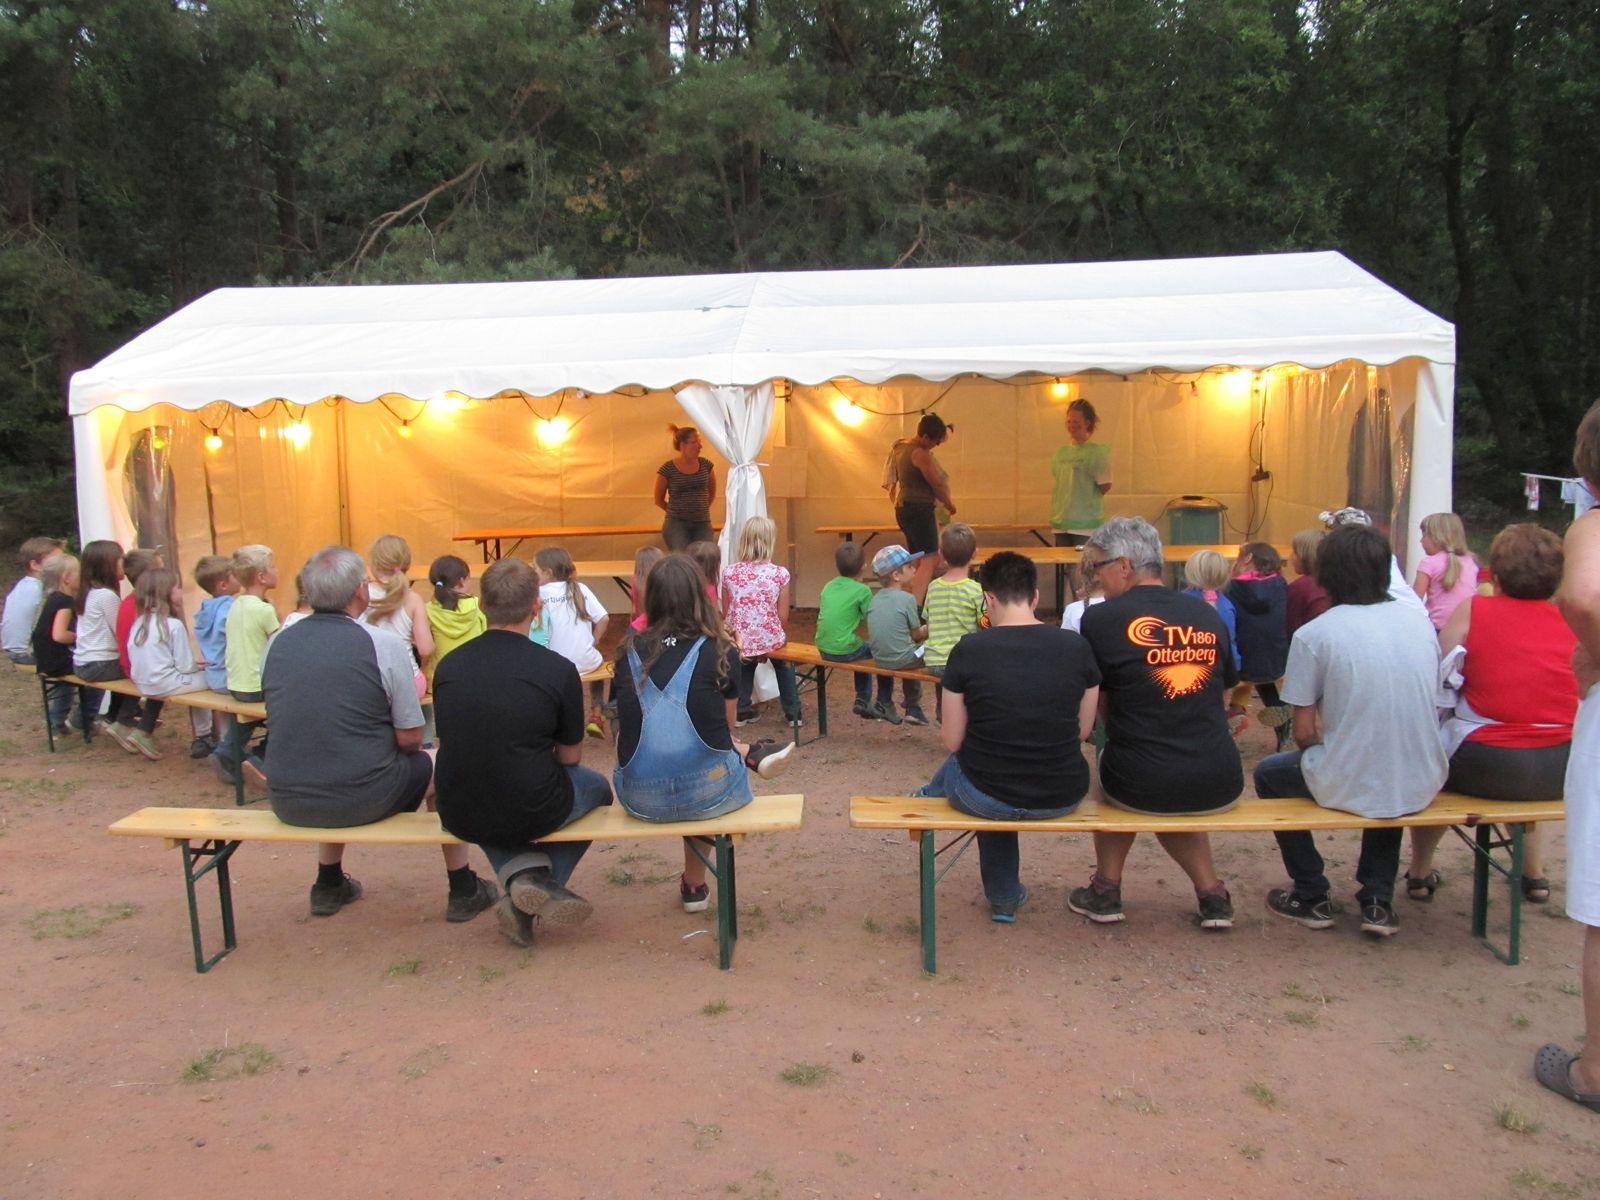 TVO Zeltlager - Vorführung